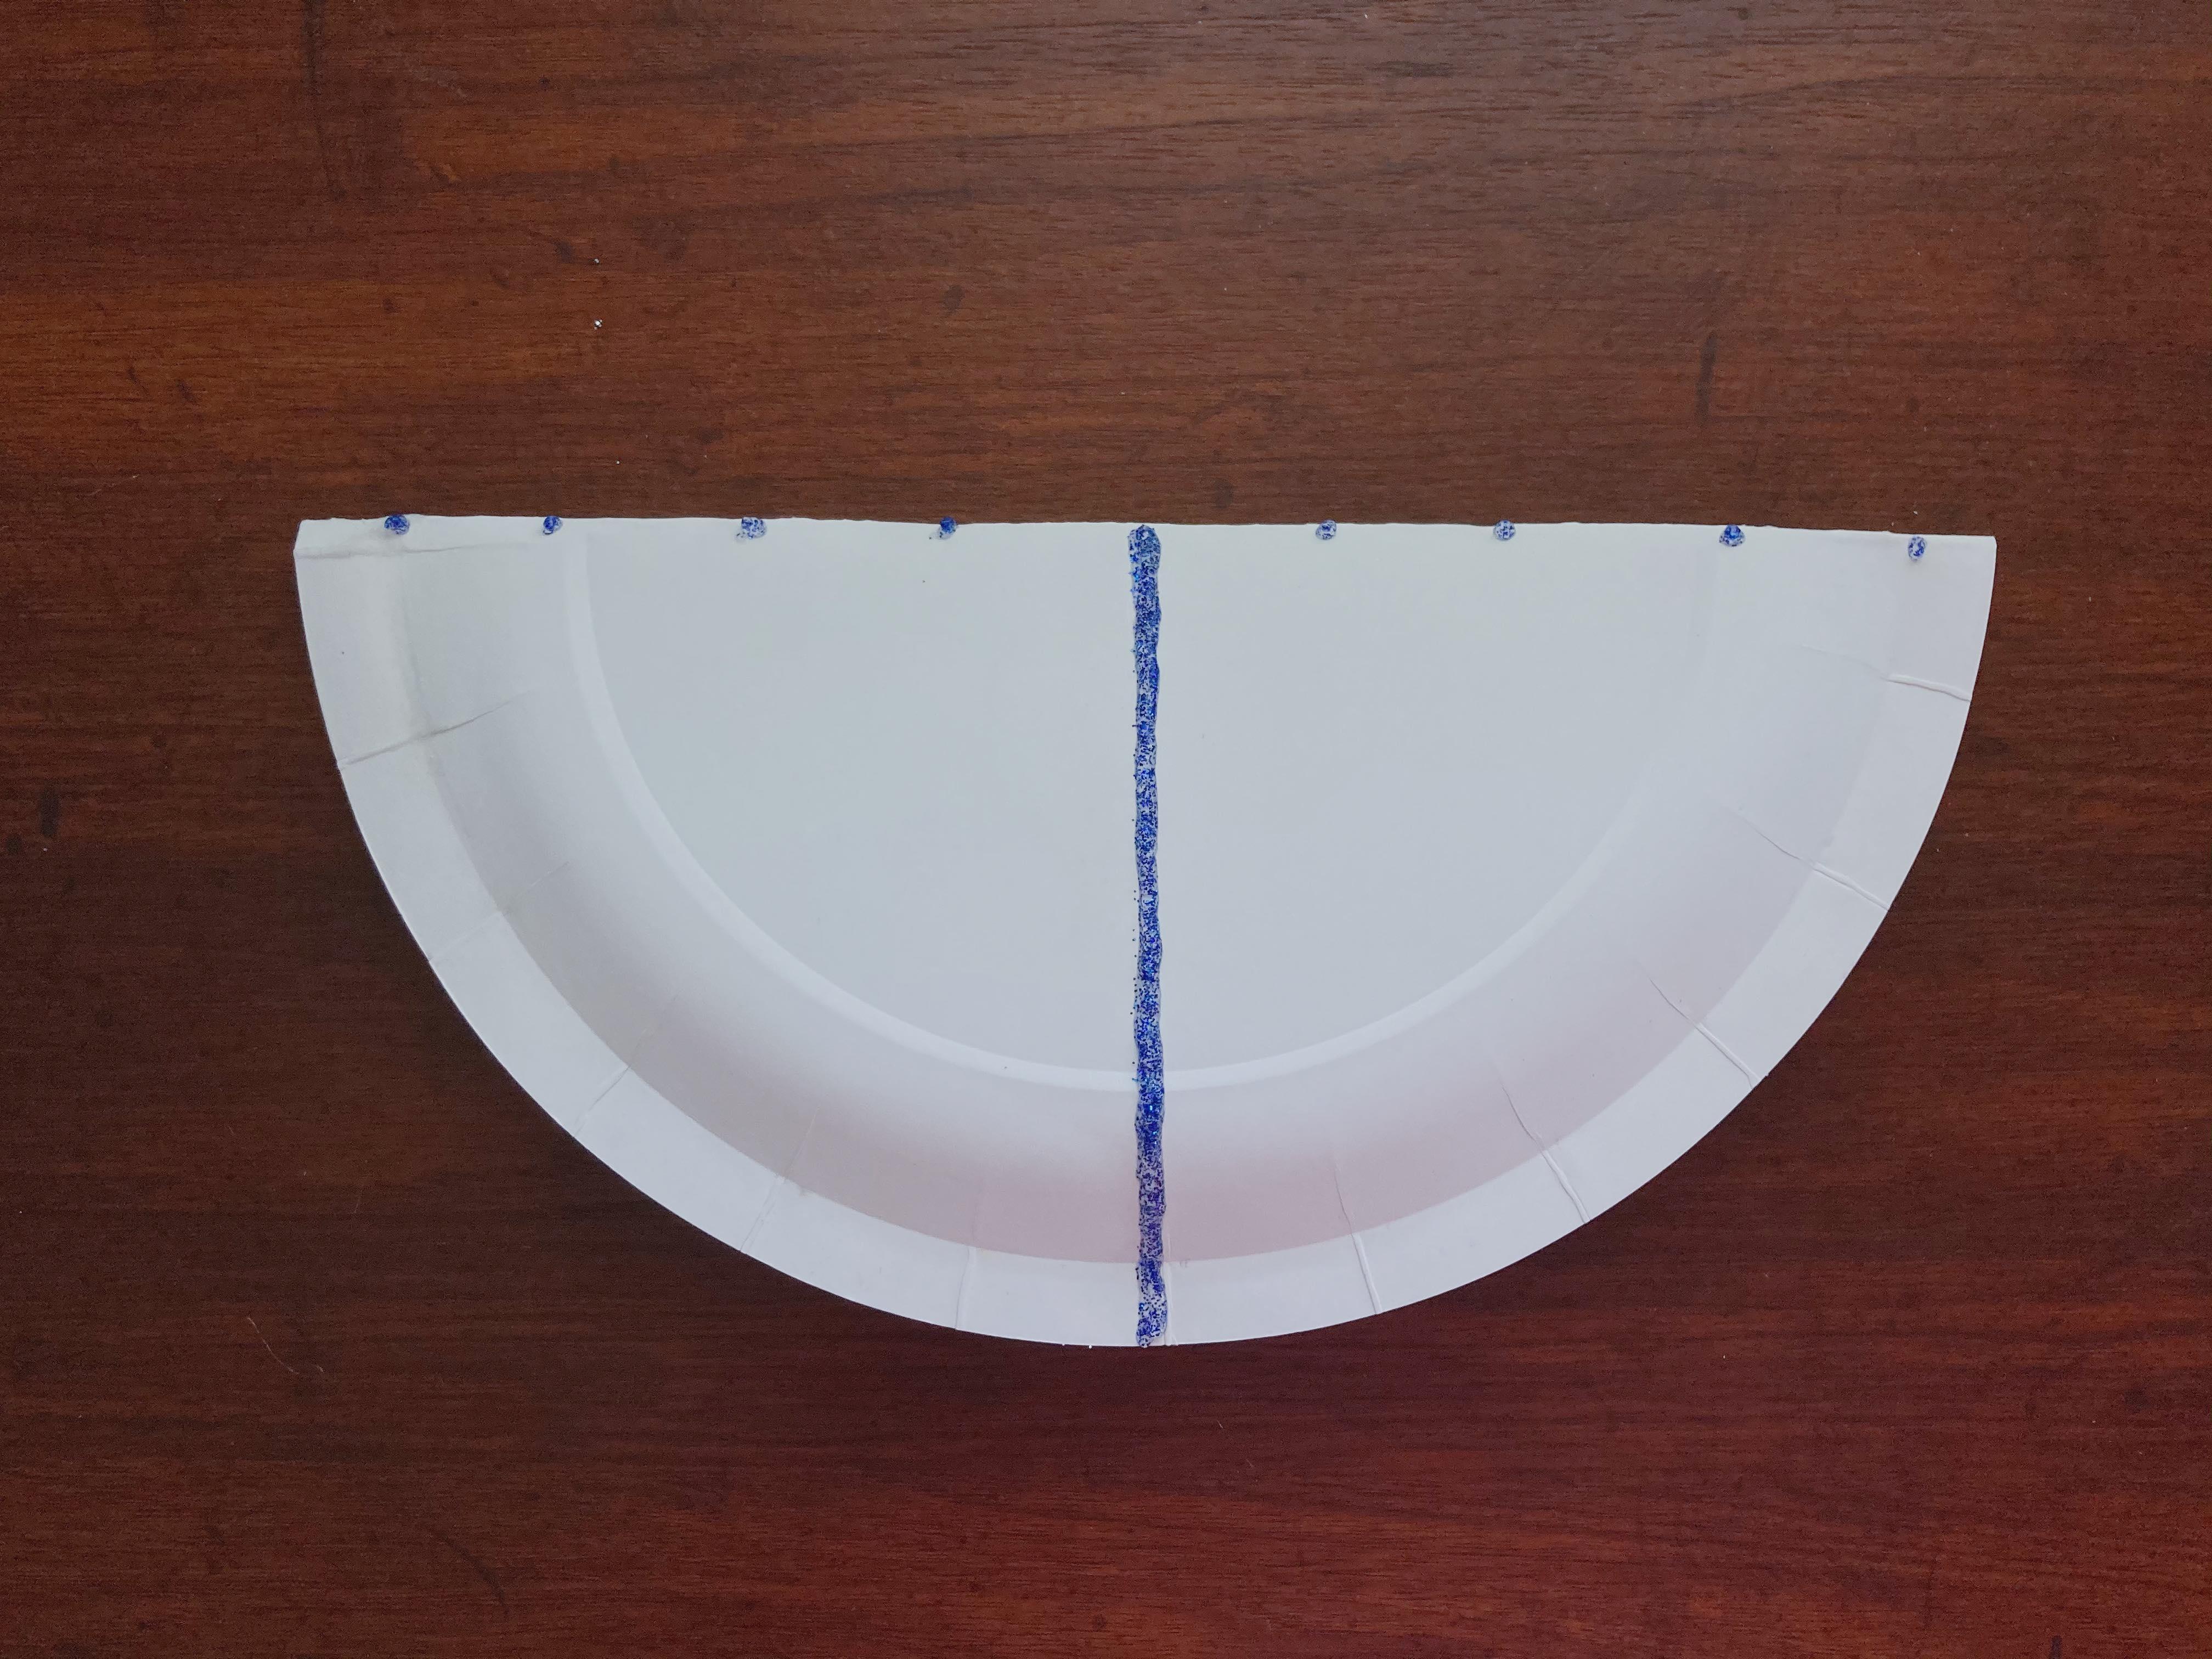 DIY menorah craft from Little Passports step 3